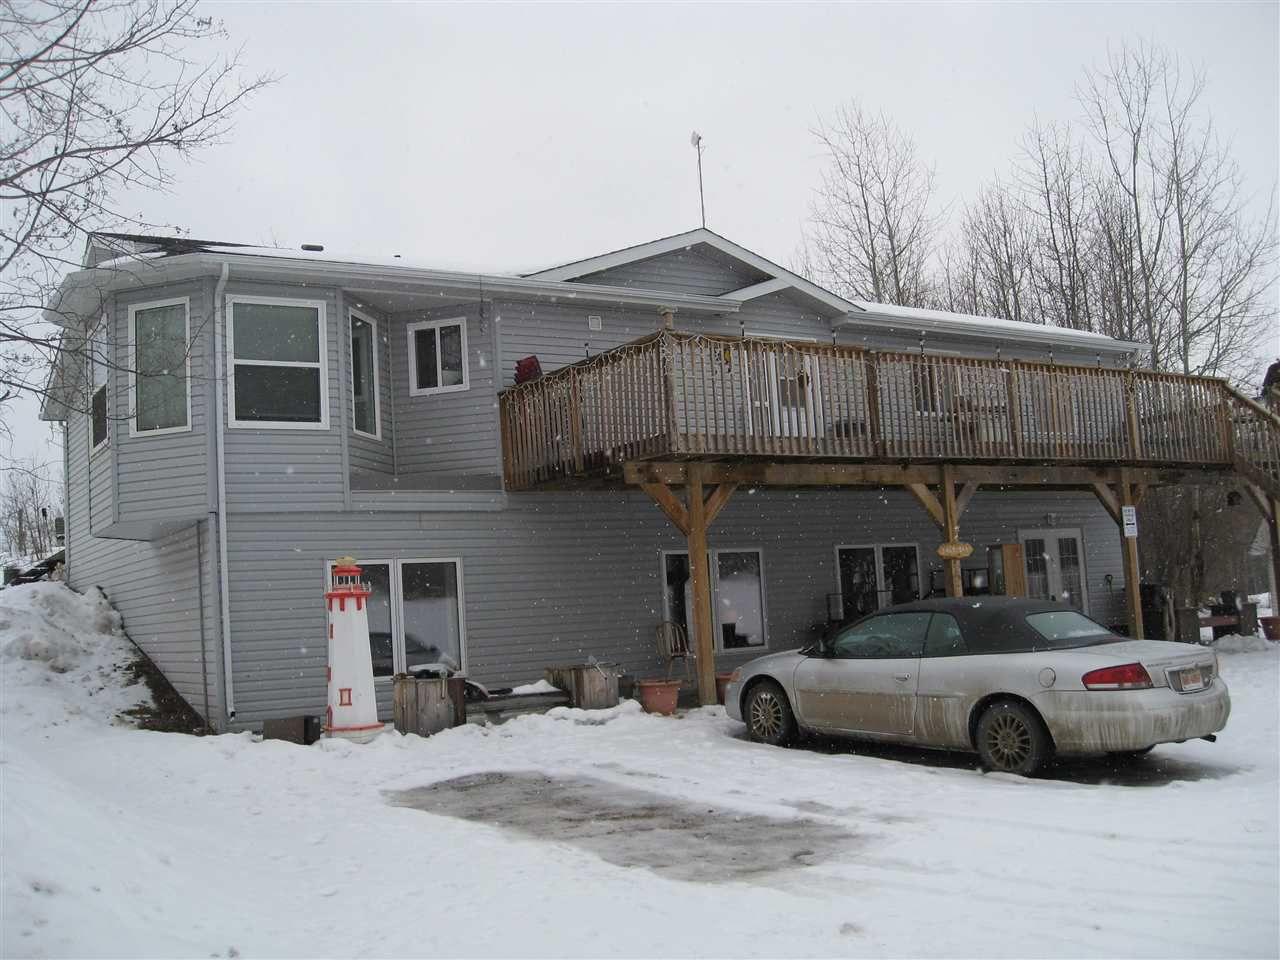 Main Photo: 124, 55219 Rge Rd 14: Rural Lac Ste. Anne County House for sale : MLS®# E4142272